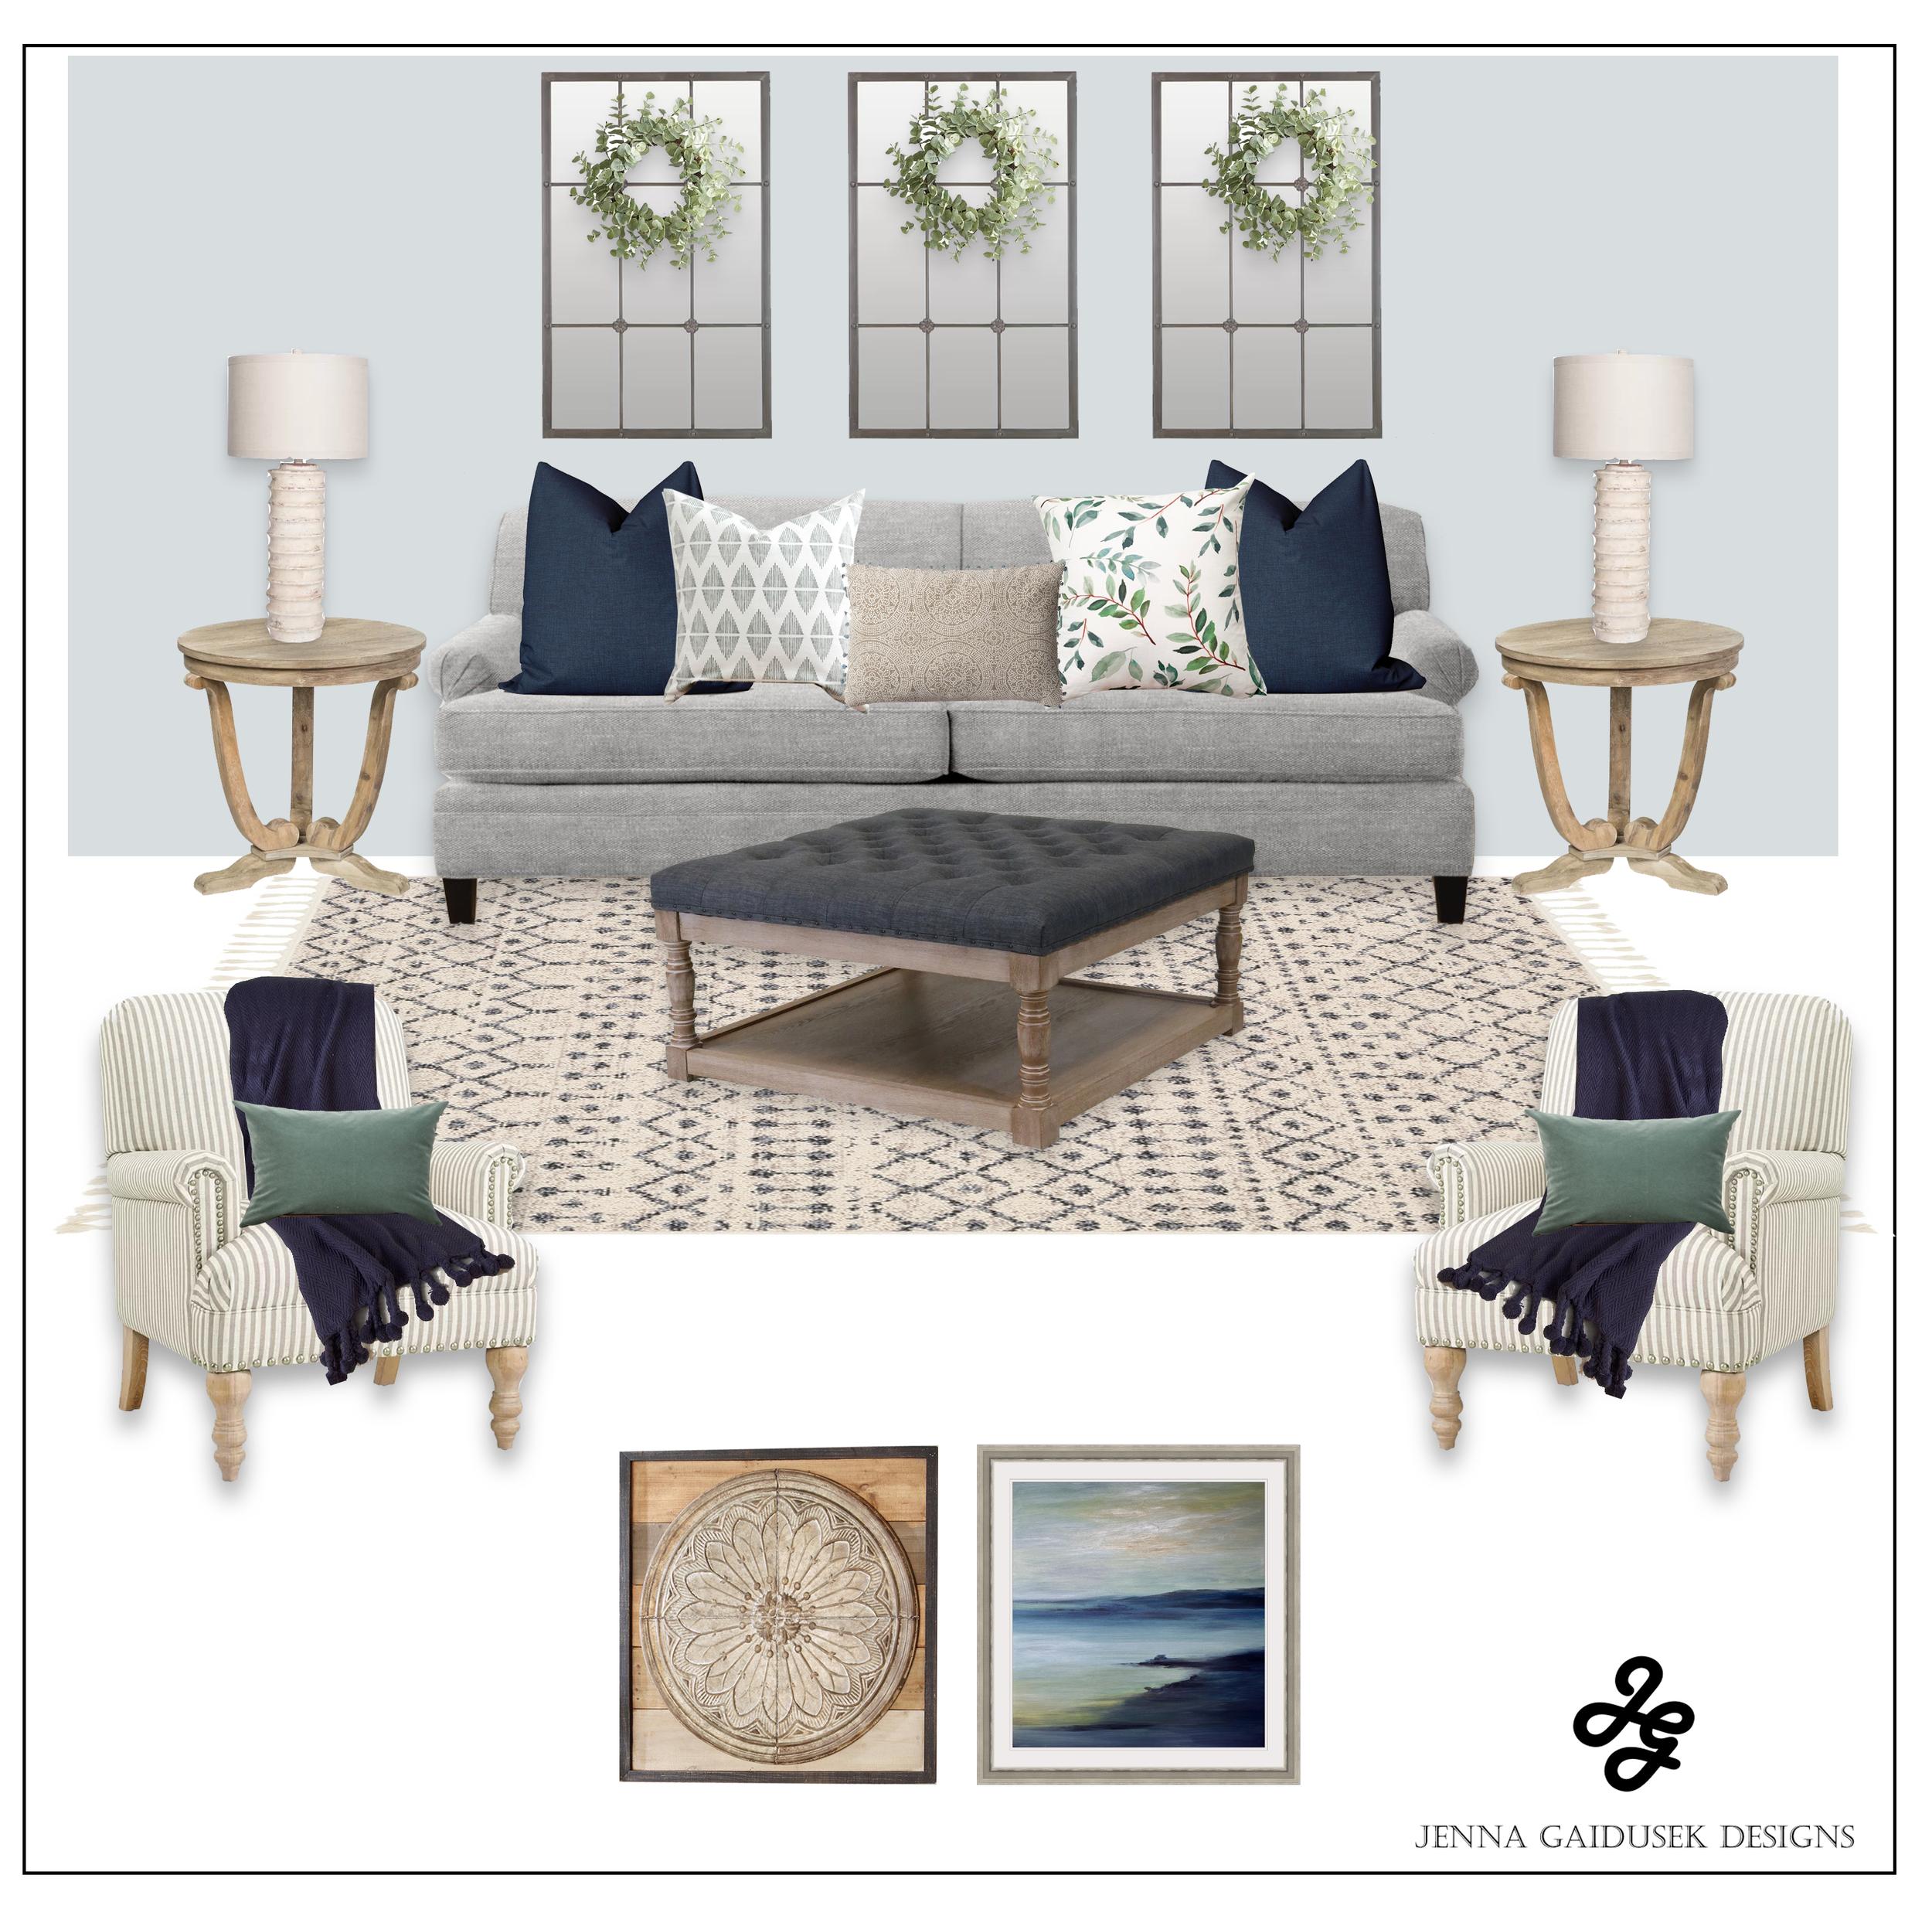 Farmhouse living room concept board